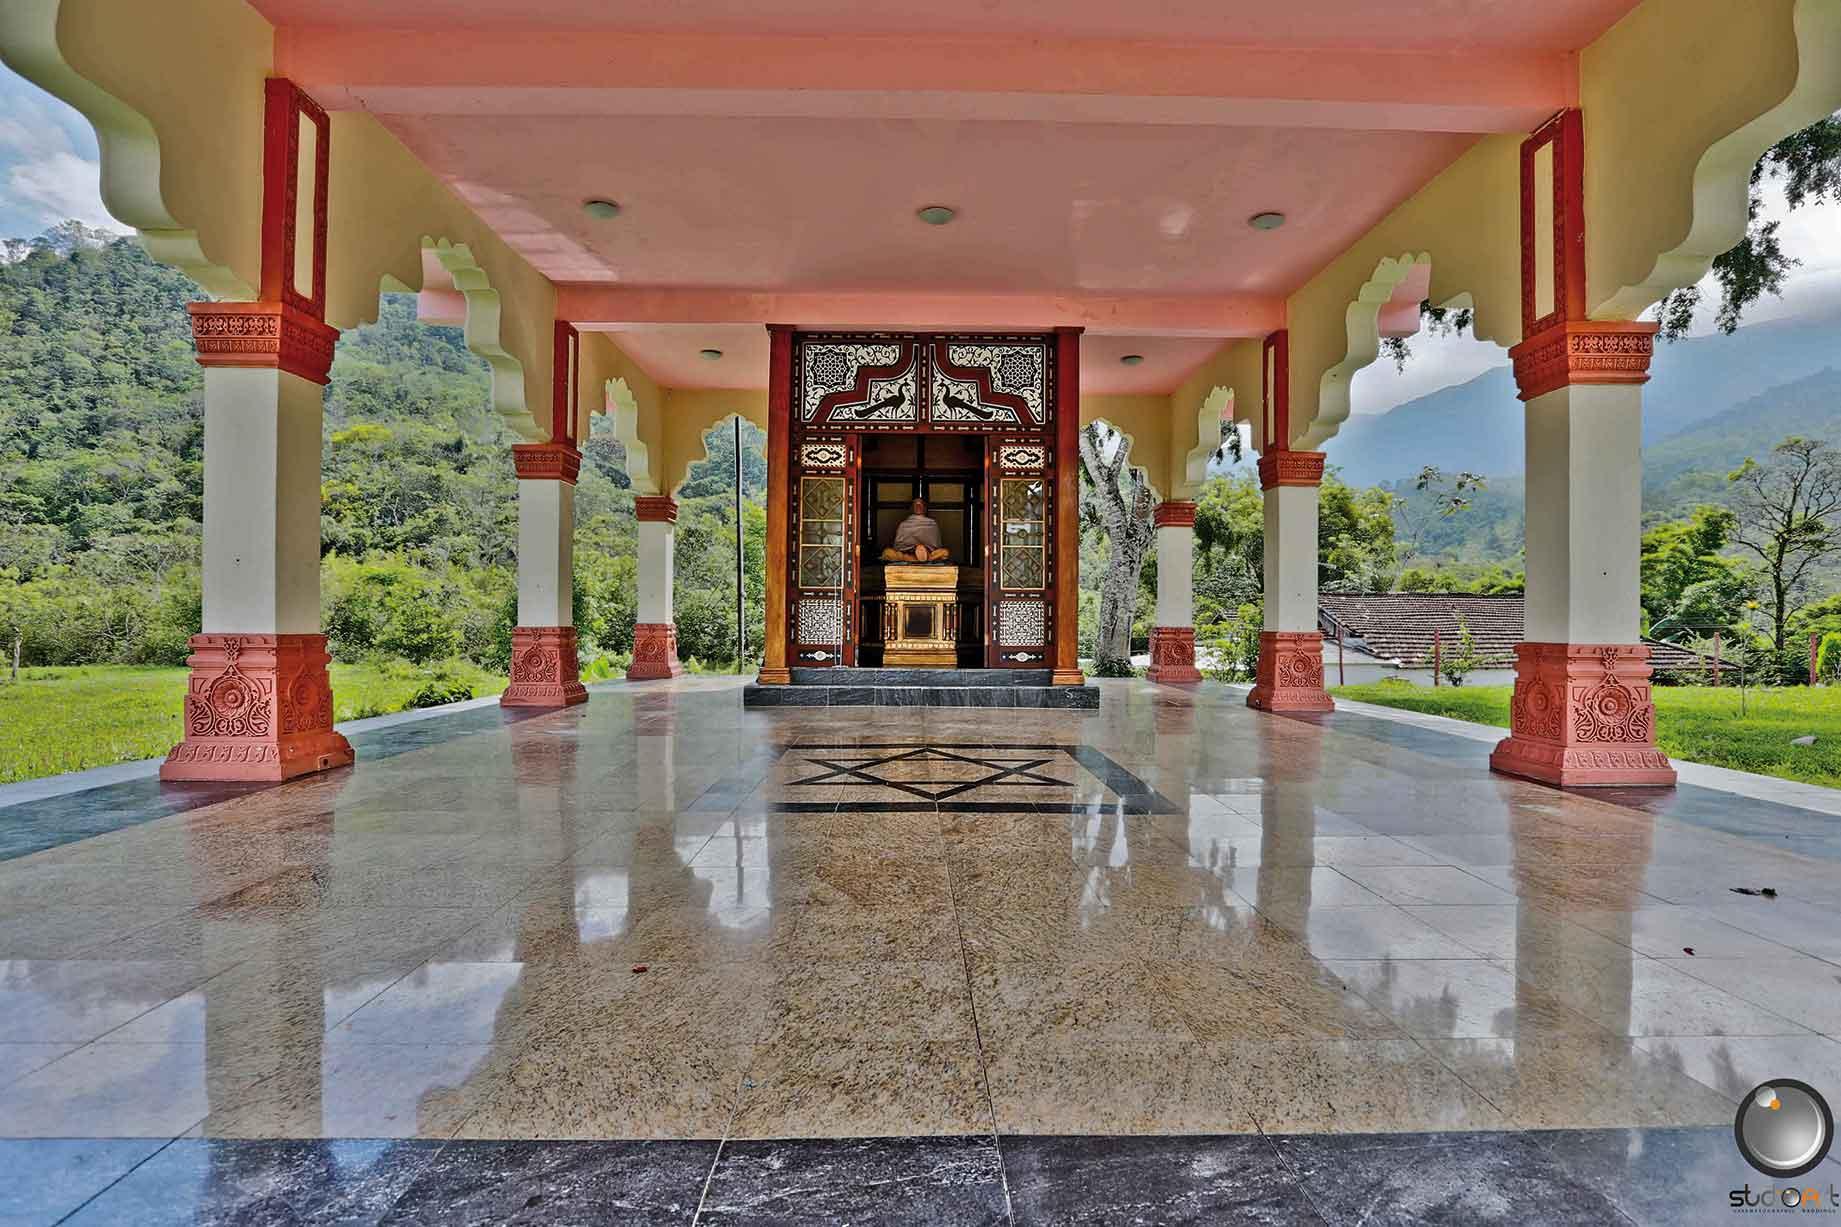 Fazenda Nova Gokula-Pindamonhangaba-Turismo-Espiritural-Bem-Estar-Fazenda-Nova-Gokula-bx